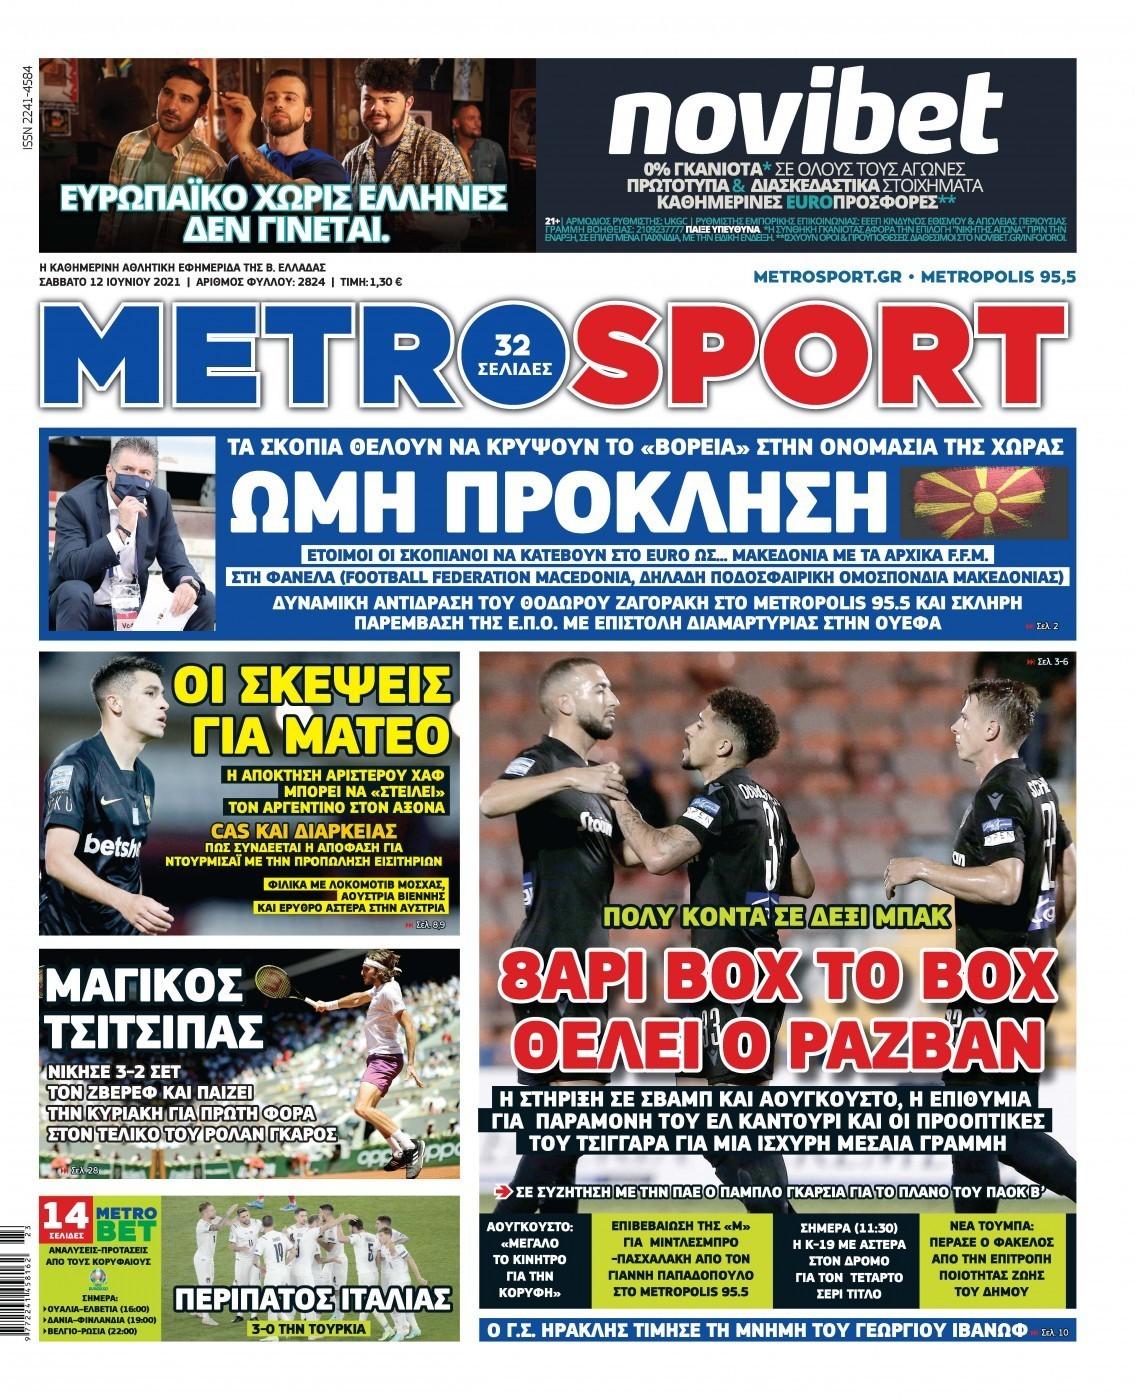 Metrosport 12.6